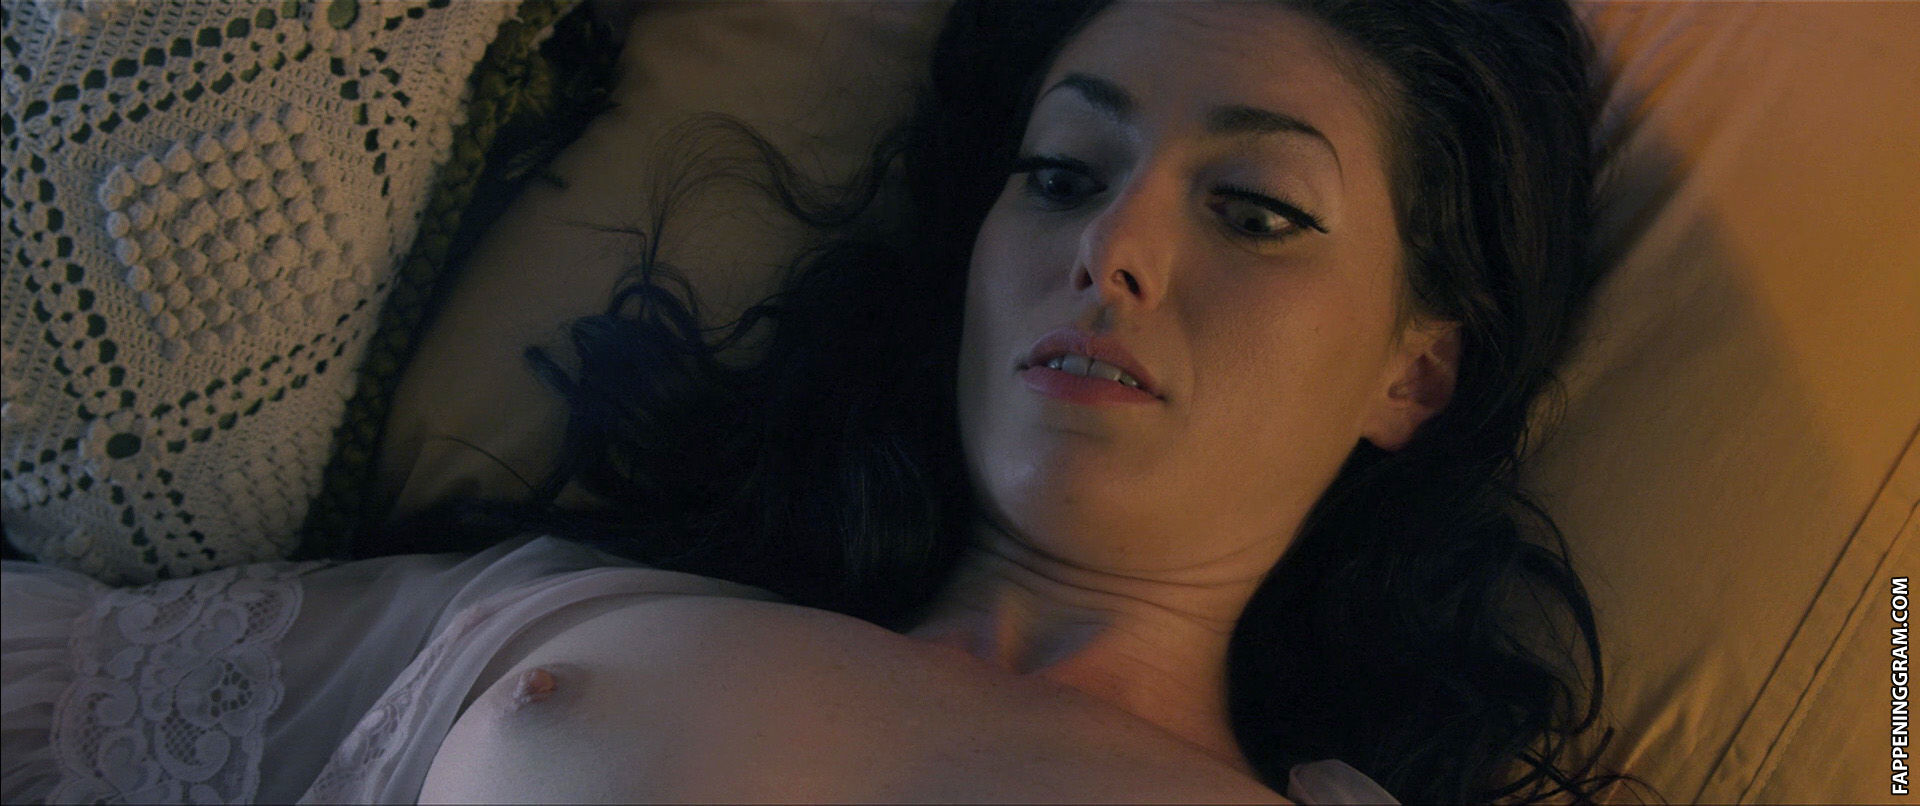 Nackt  Leah Gradney images.tinydeal.com: Meathook